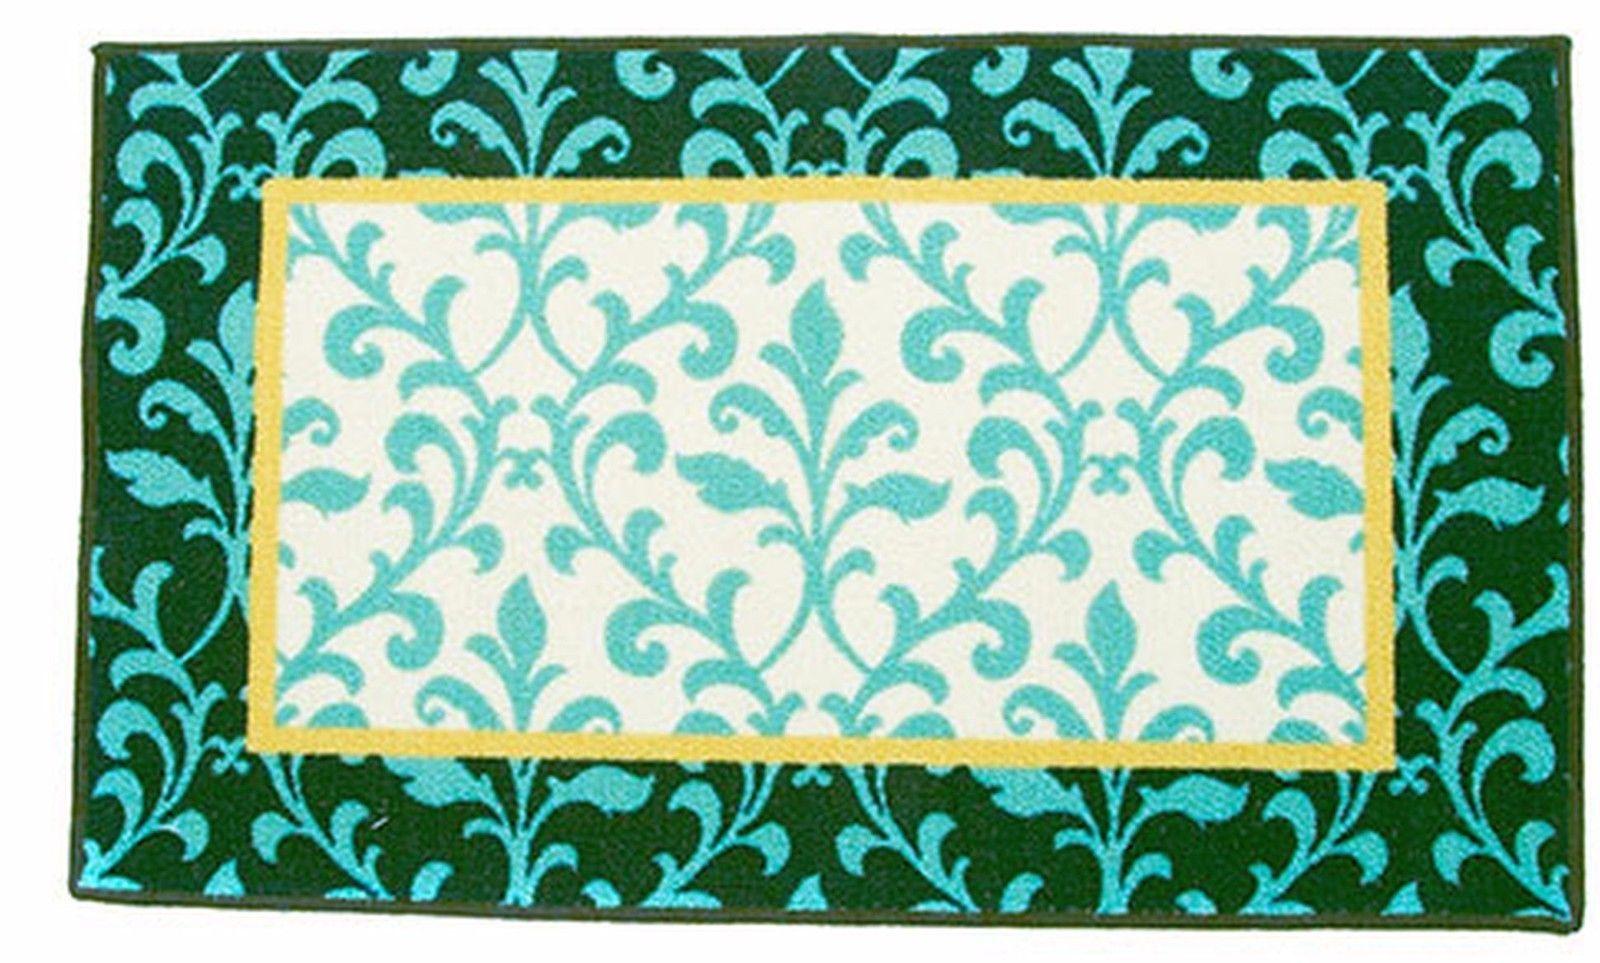 "KITCHEN PRINTED ACCENT RUG (nonskid back) (18"" x 30""), VINTAGE VINE by Waverly - $16.82"